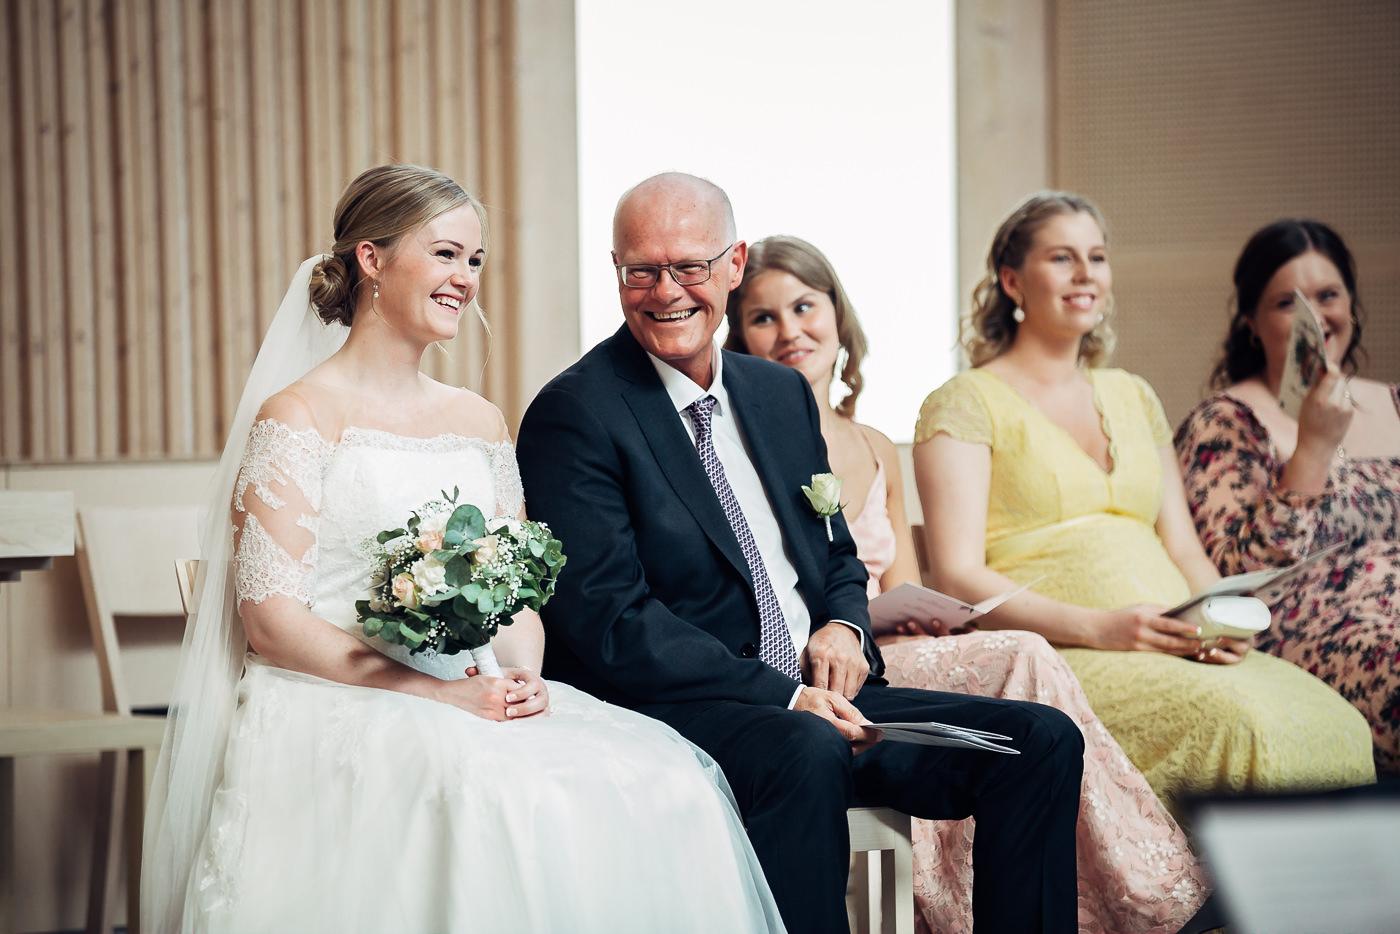 Ida Nathalie & Sebastian  - vakkert junibryllup i Lillestrøm Bryllupsfotograf Hellerud Akershus 27